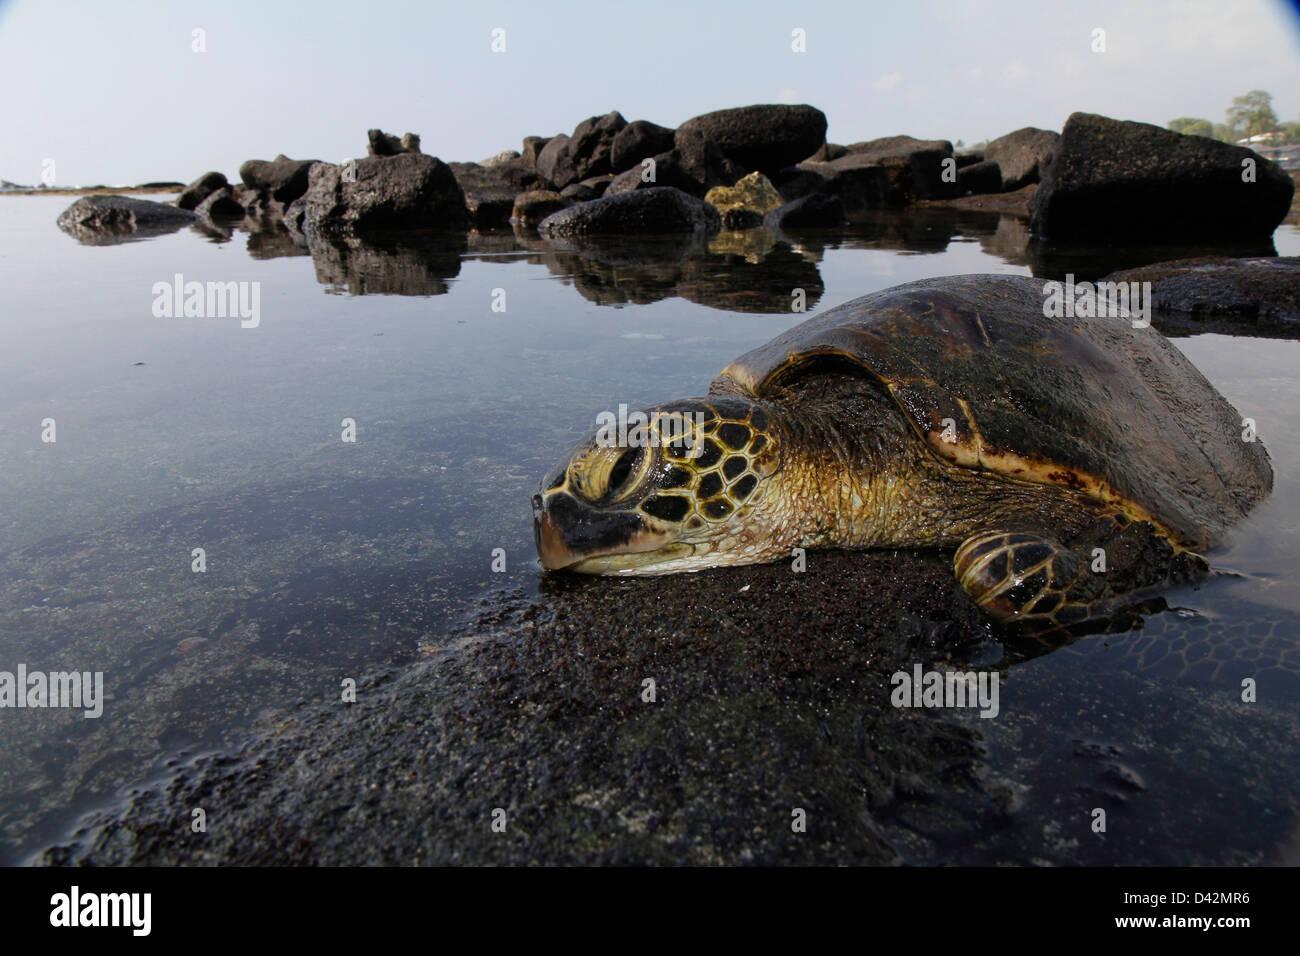 Green sea turtle basking on lava Hawaii the Big Island pacific ocean - Stock Image